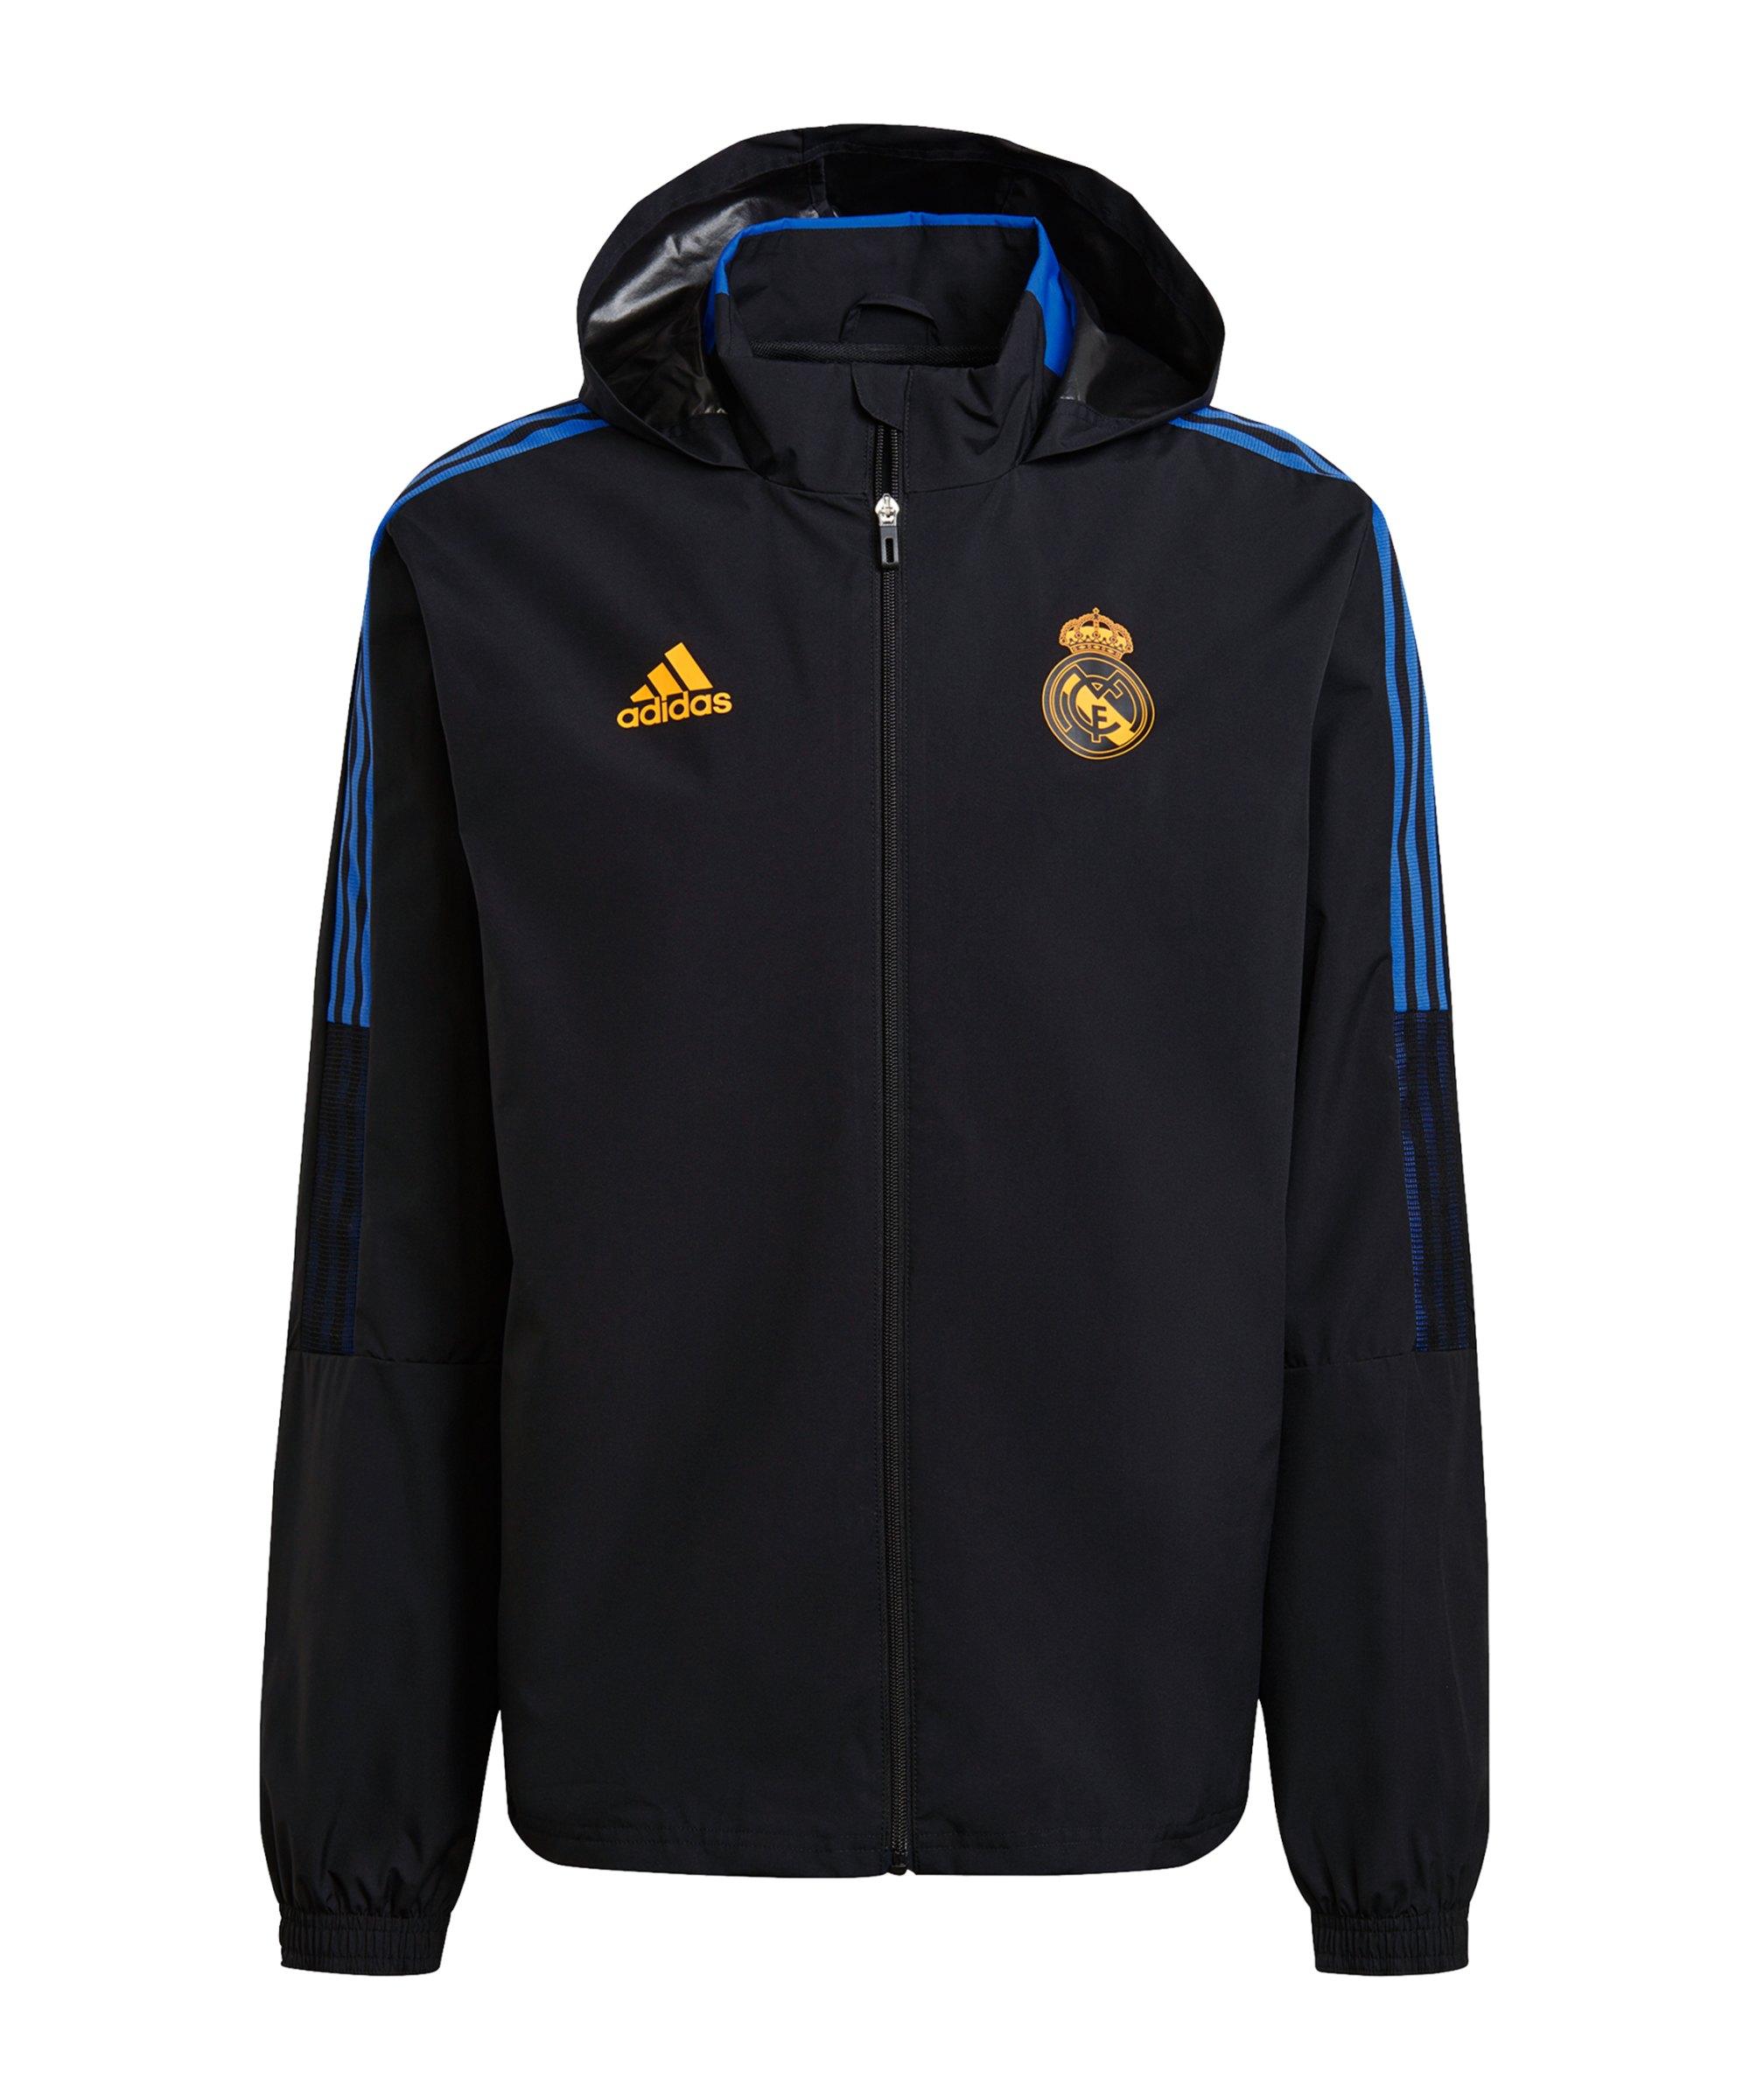 adidas Real Madrid Allwetterjacke Schwarz - schwarz